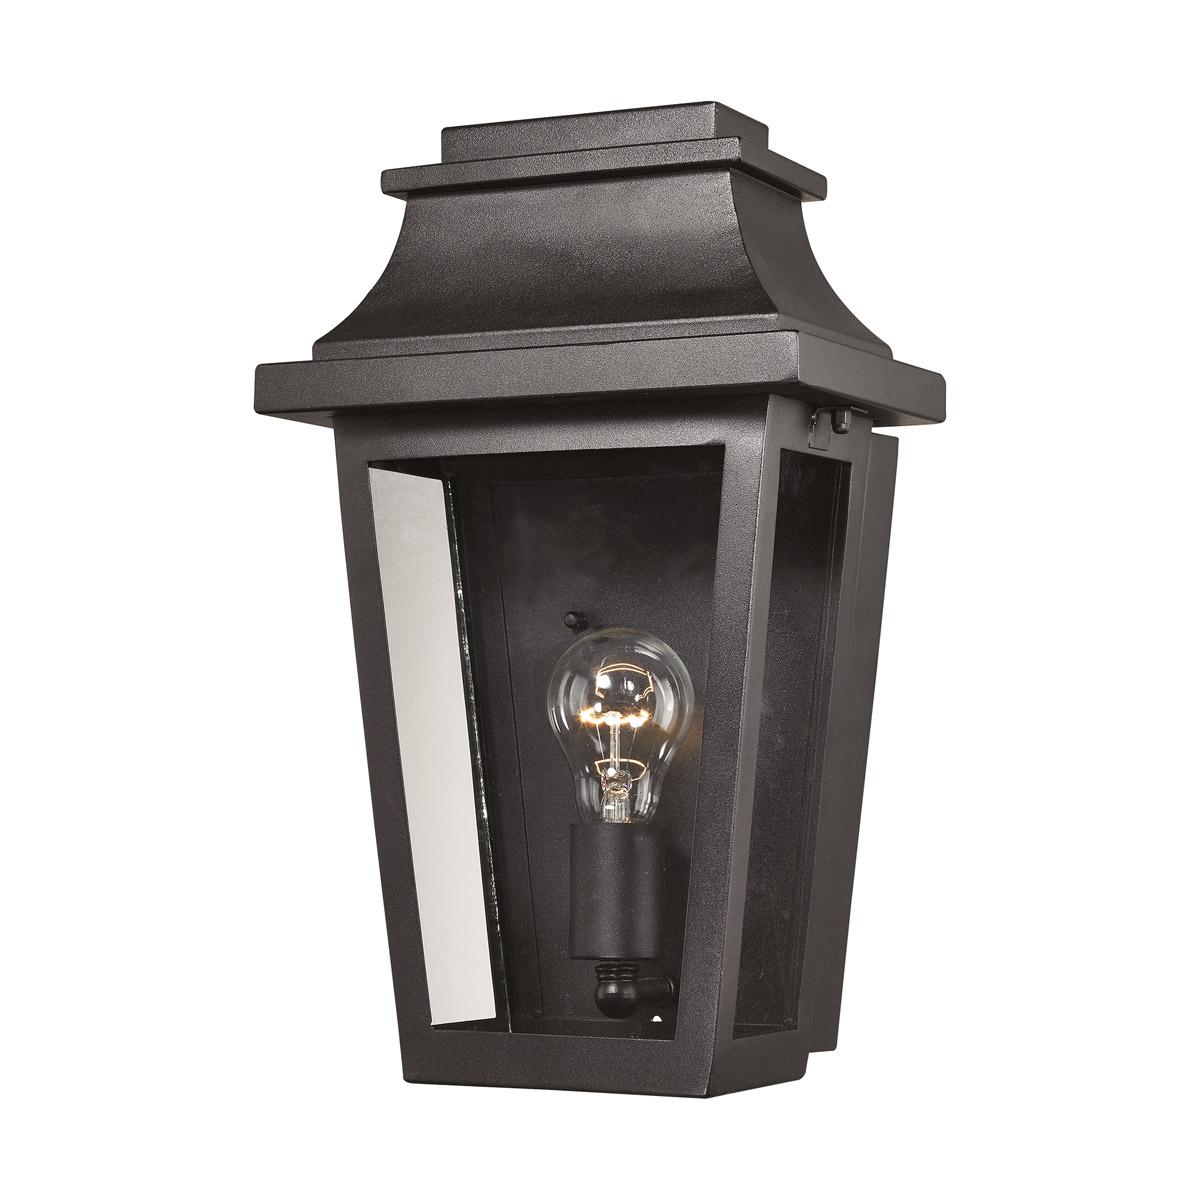 ELK Lighting Covina 46190 Modern Outdoor Lamps Brooklyn,New York- Accentuations Brand